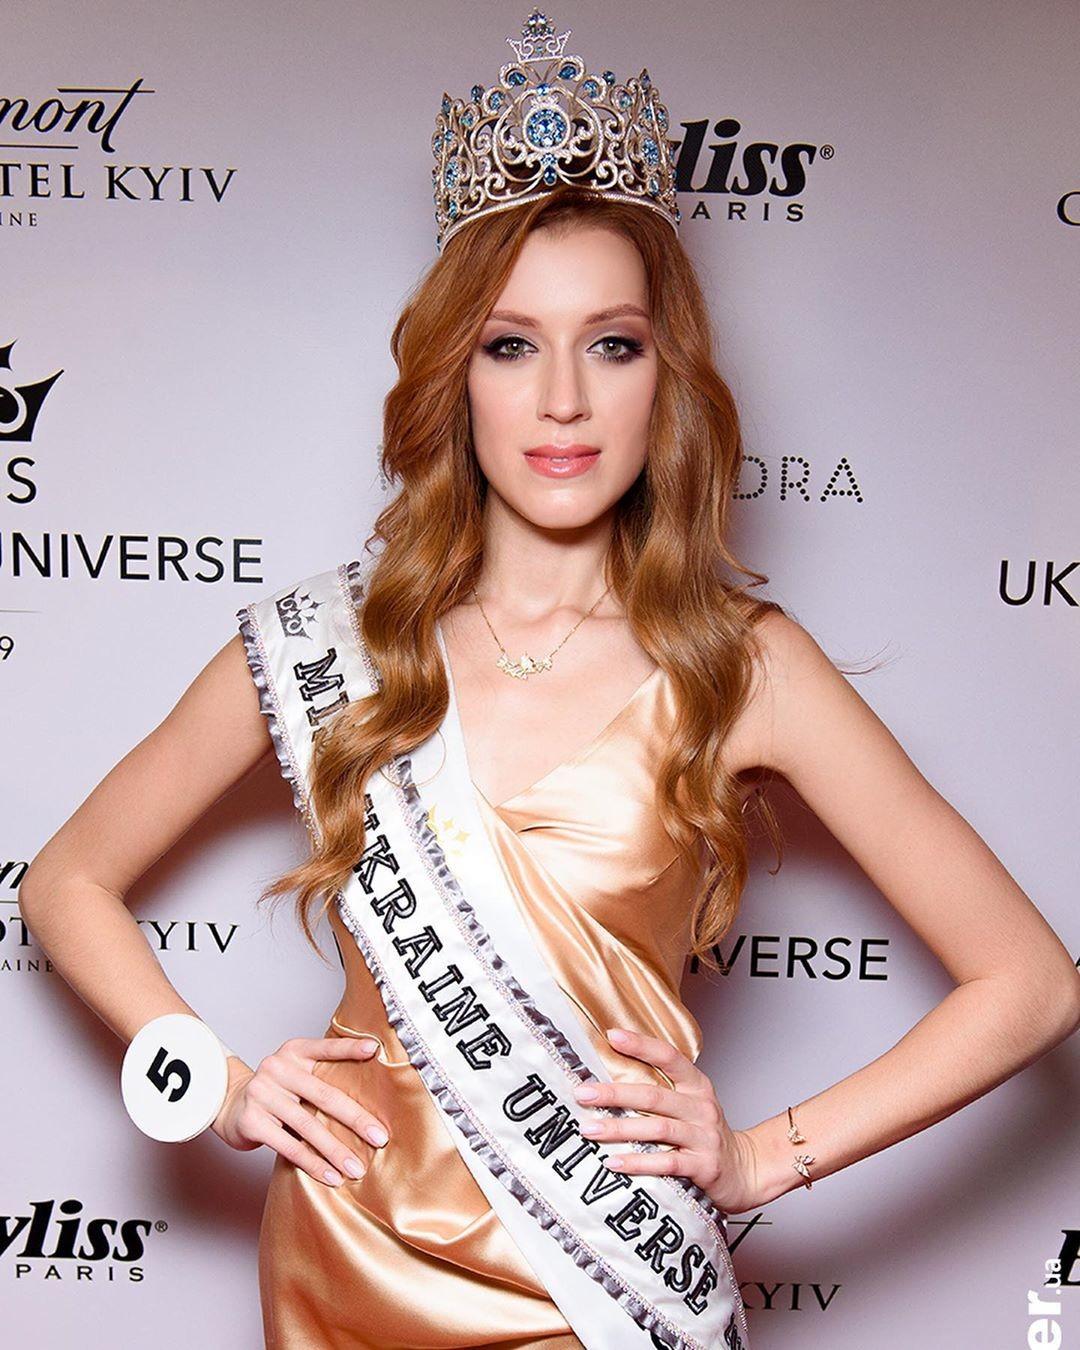 26-летняя Анастасия Суббота